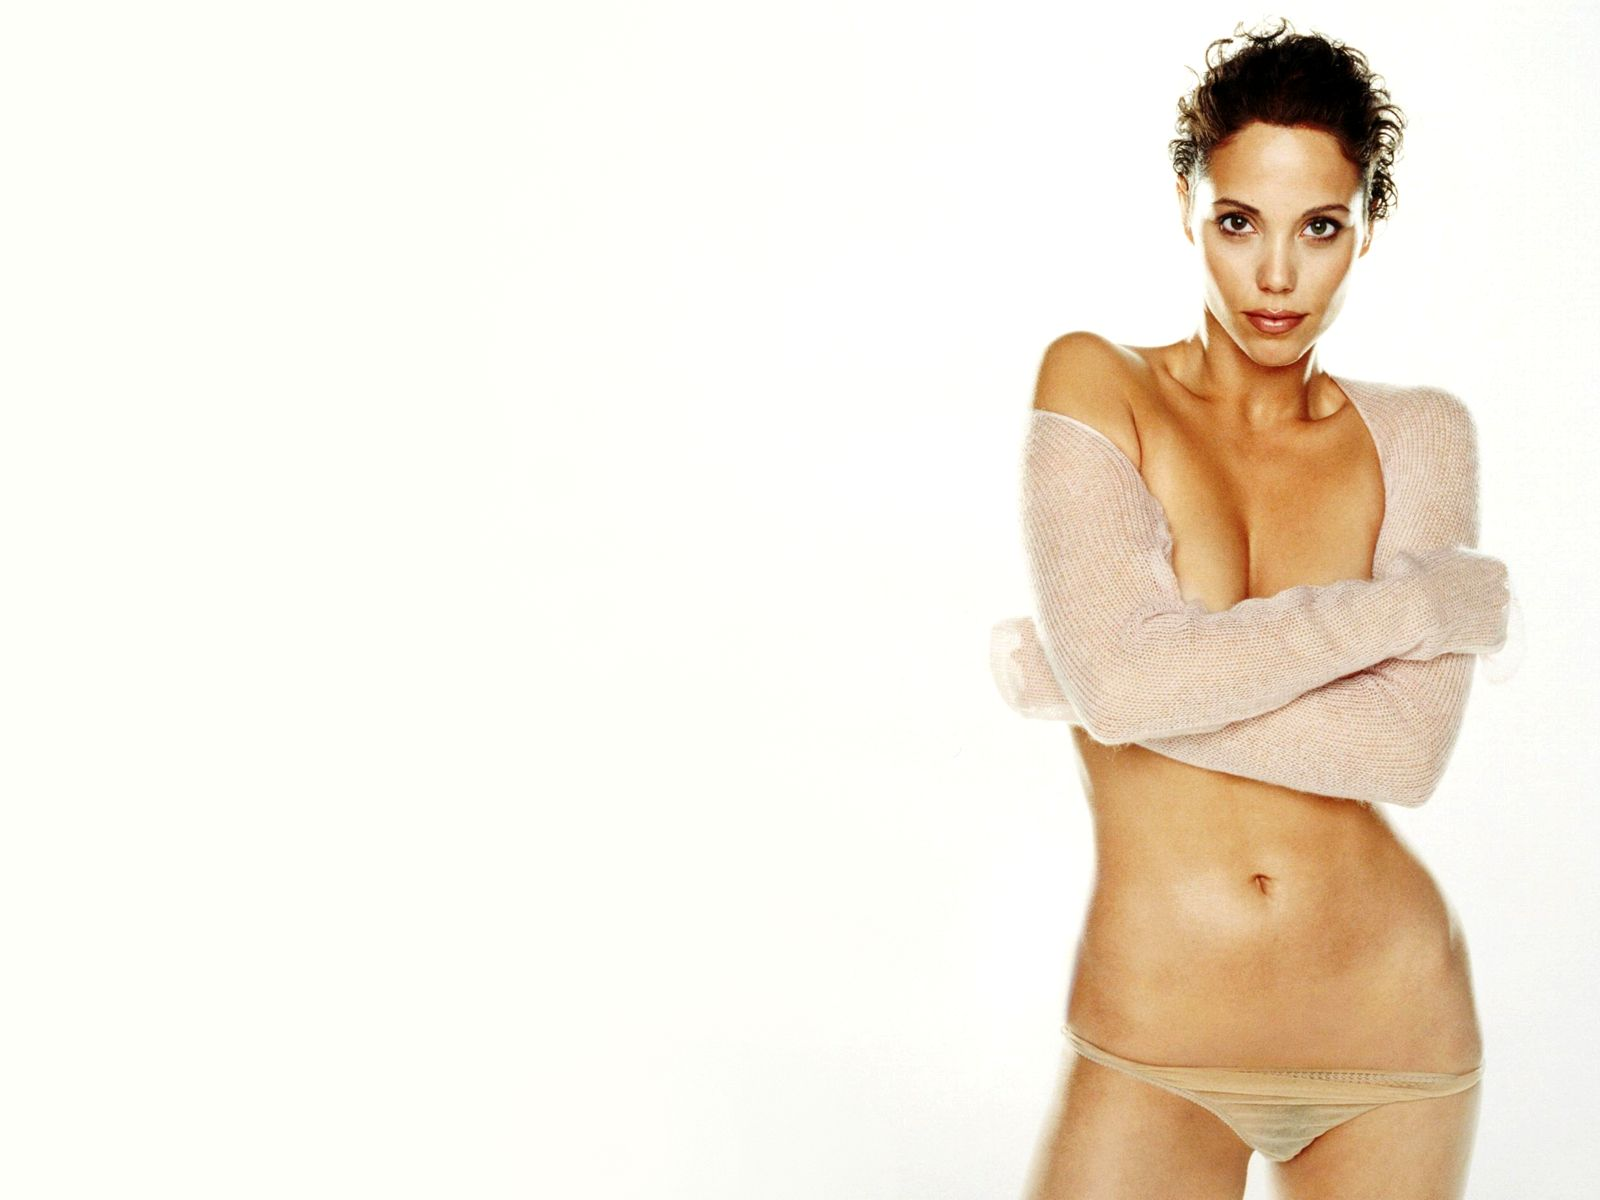 http://3.bp.blogspot.com/-qZScobAW0GI/T1bgh3u7FWI/AAAAAAAAAP8/anjplDWvgAY/s1600/Elizabeth_Berkley_Hot_Sexy.jpg